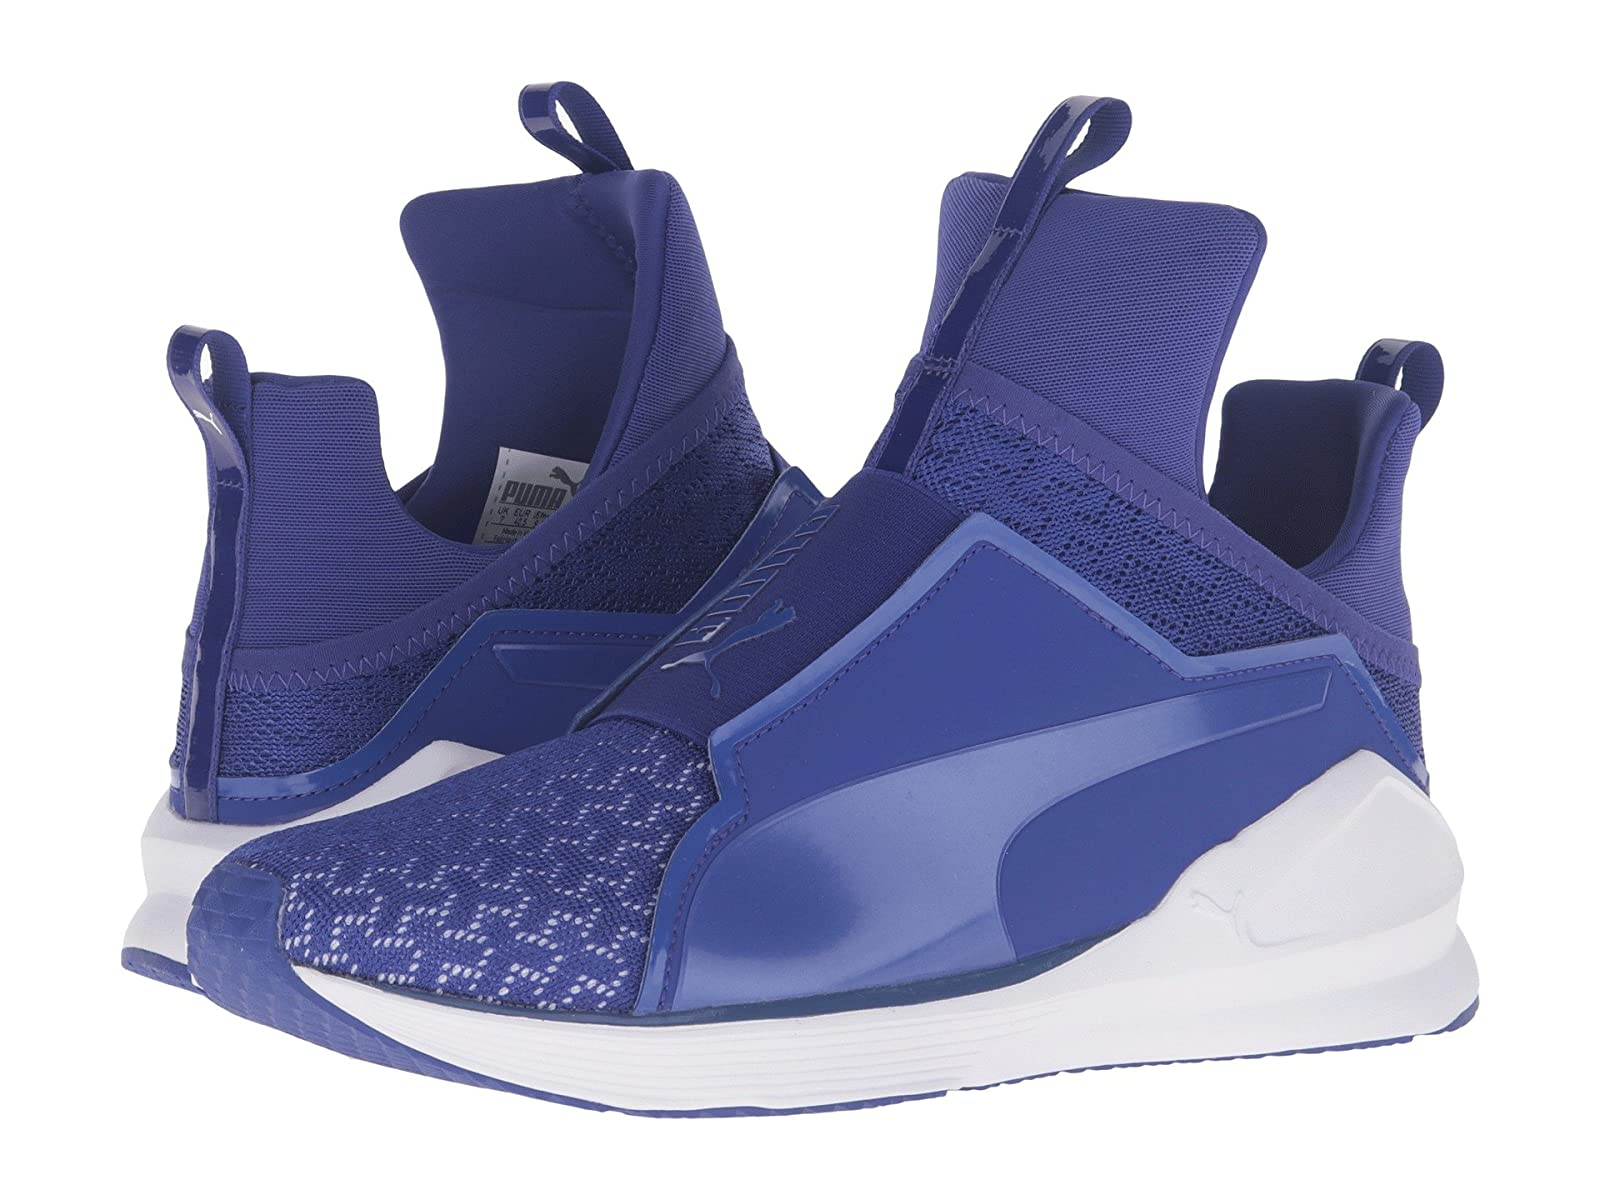 PUMA Fierce ENG MeshCheap and distinctive eye-catching shoes